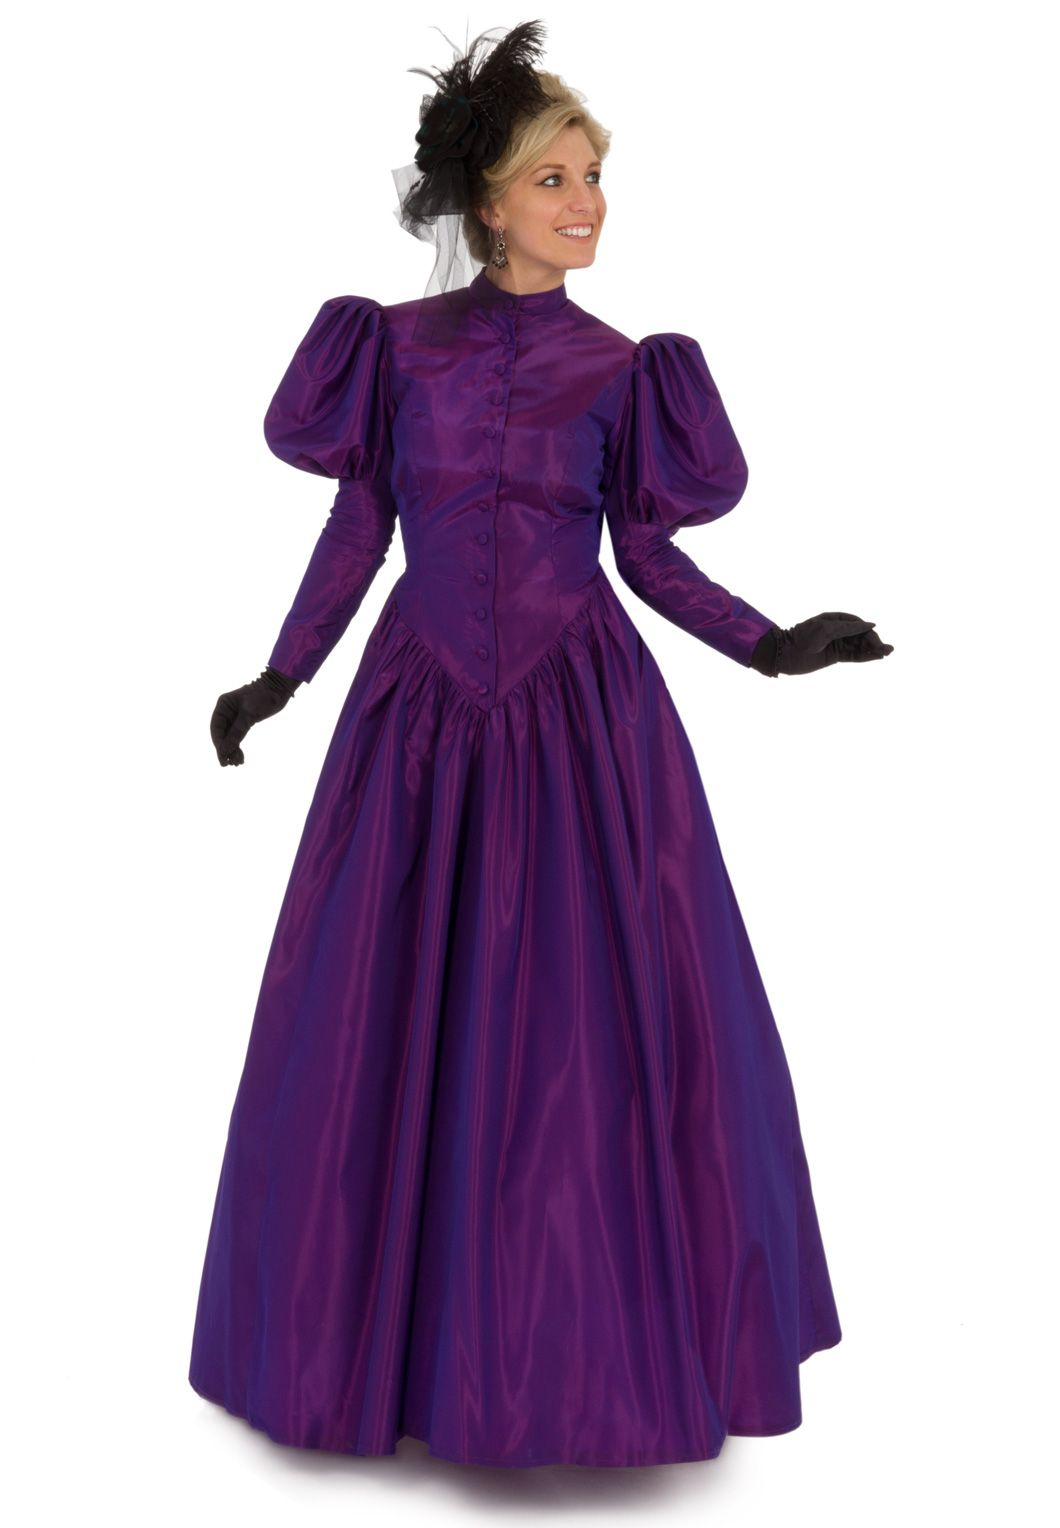 Jobeth Classic Victorian Gown Victorian Gown Dresses Victorian Fashion Dresses [ 1528 x 1060 Pixel ]